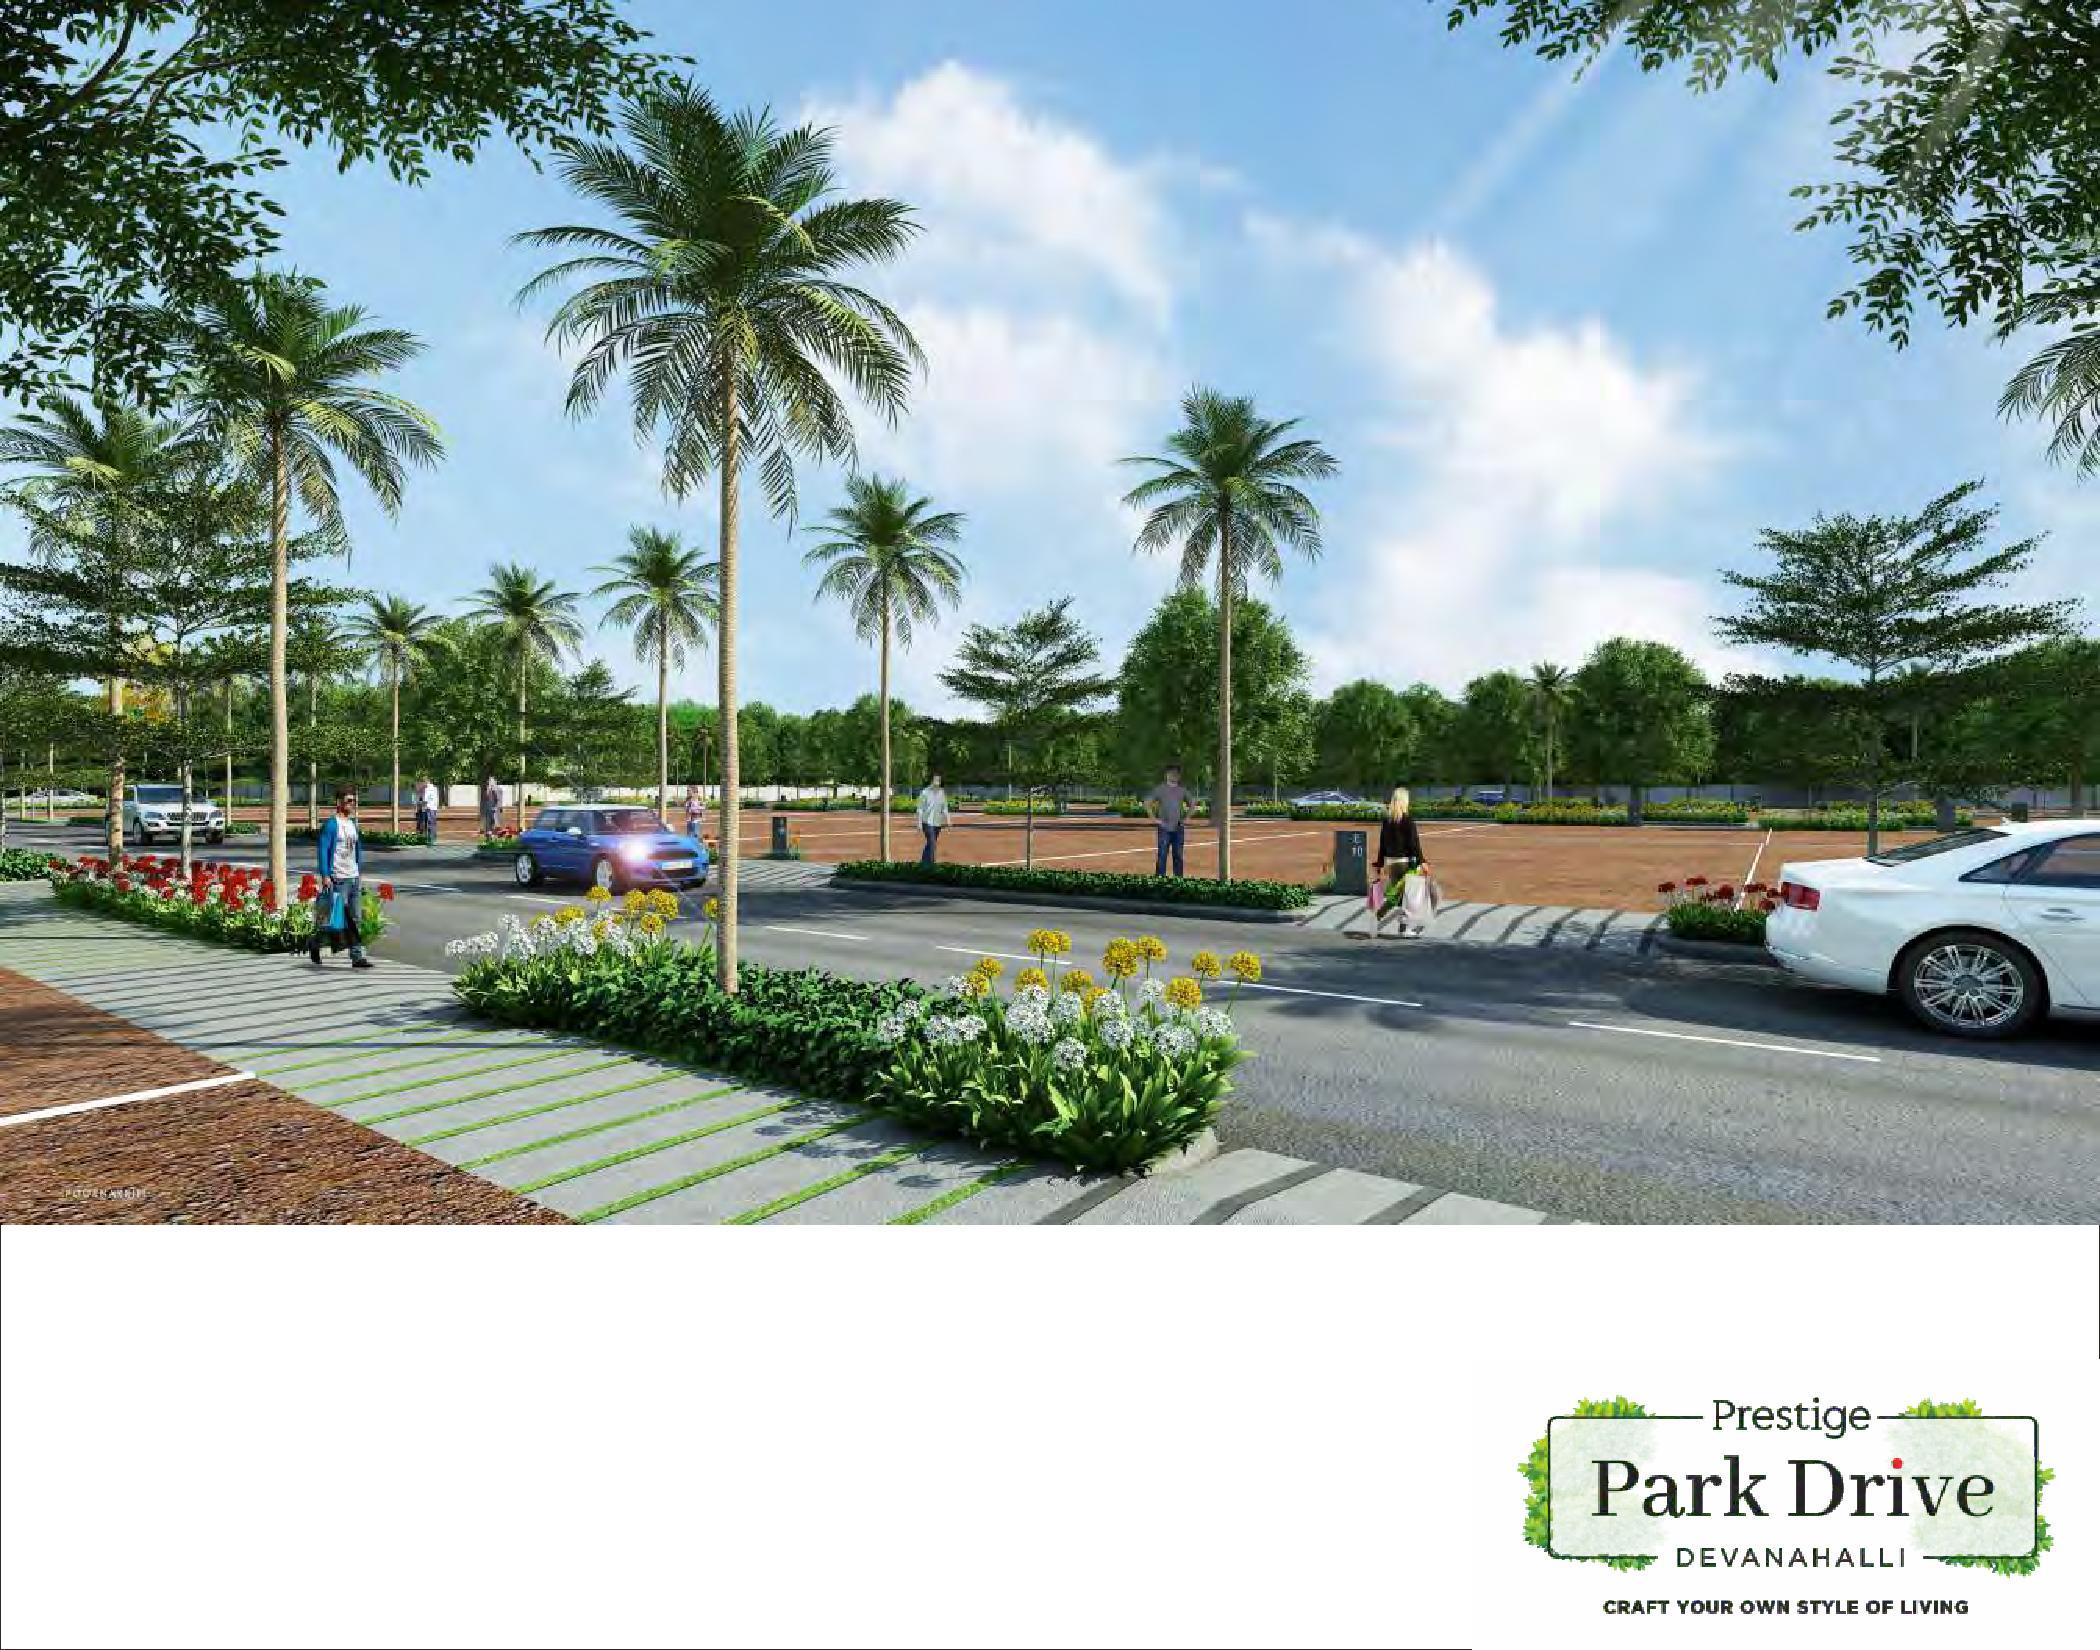 Prestige-Park-Drive-Plot-in-Devanahalli-Bangalore-Image-03